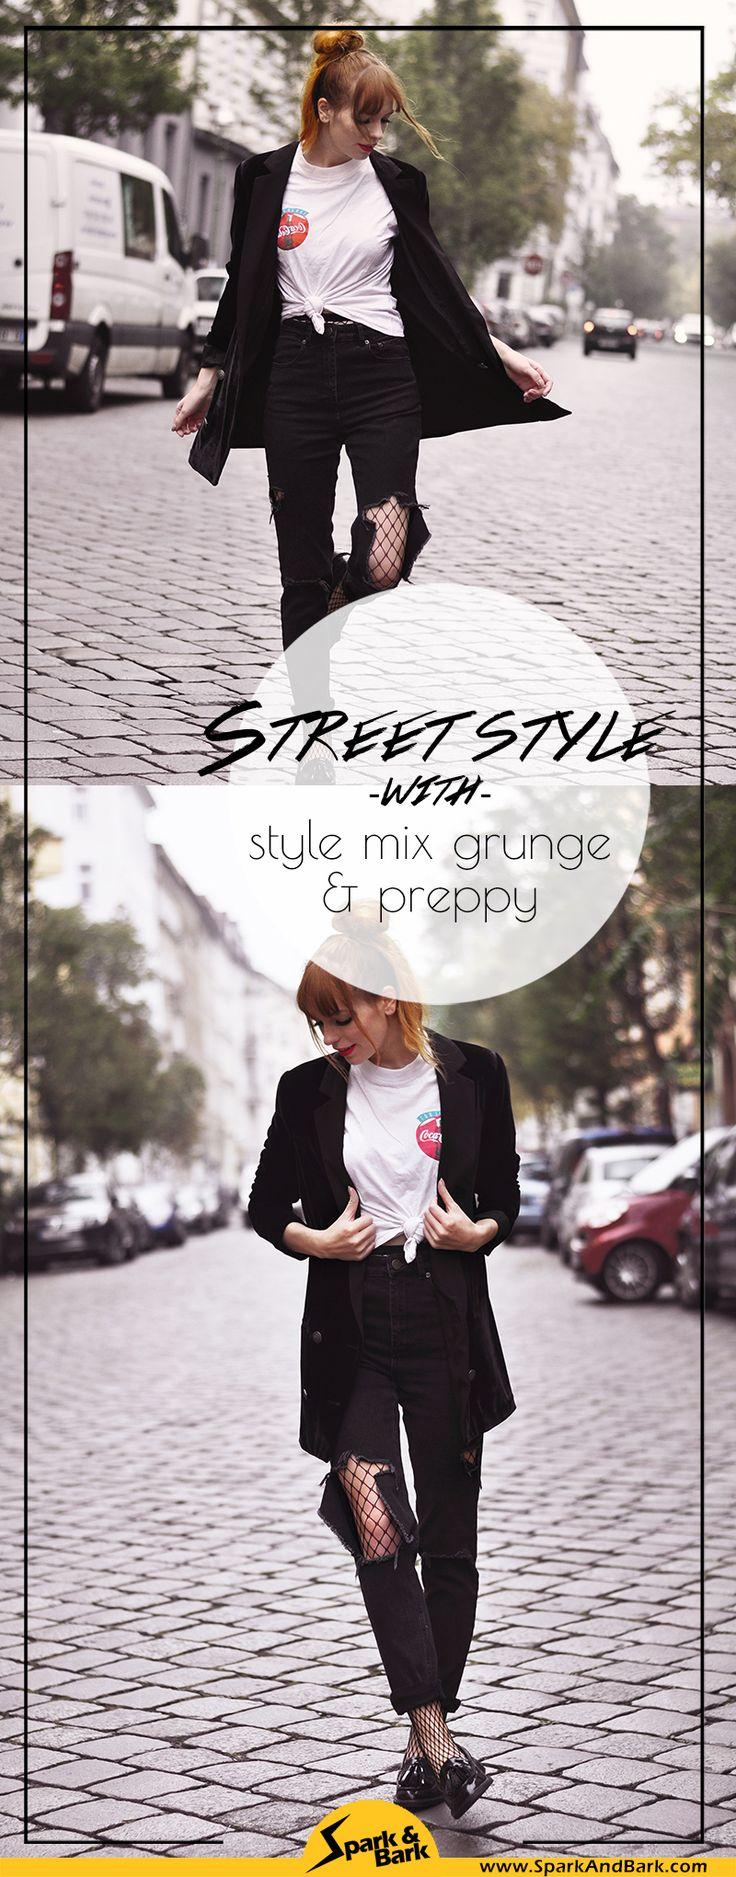 Grunge and preppy style mix Berlin street style, Berlin grunge street fashion